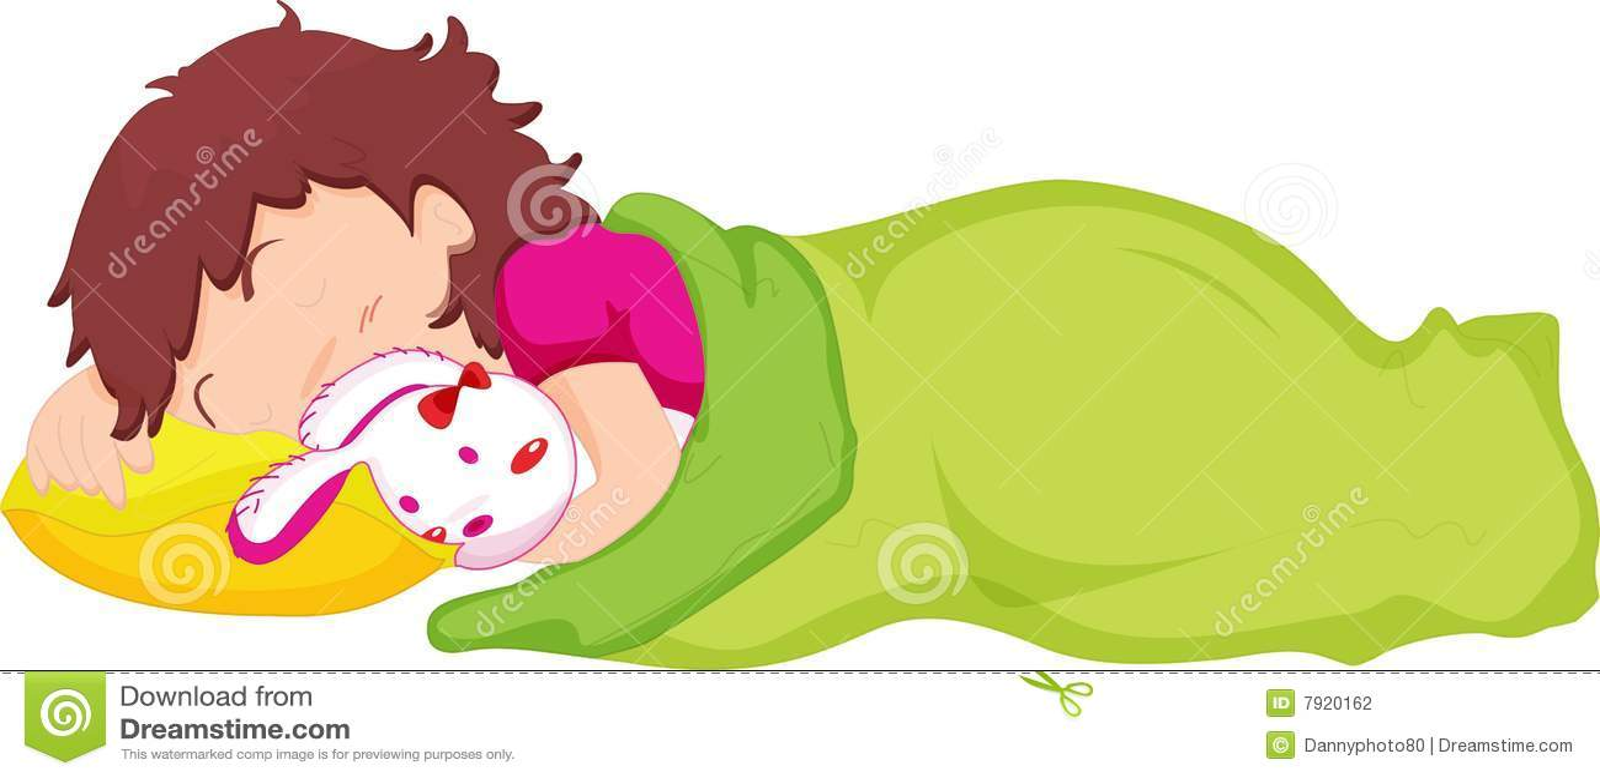 Child sleeping stock illustration. Illustration of drawing ...